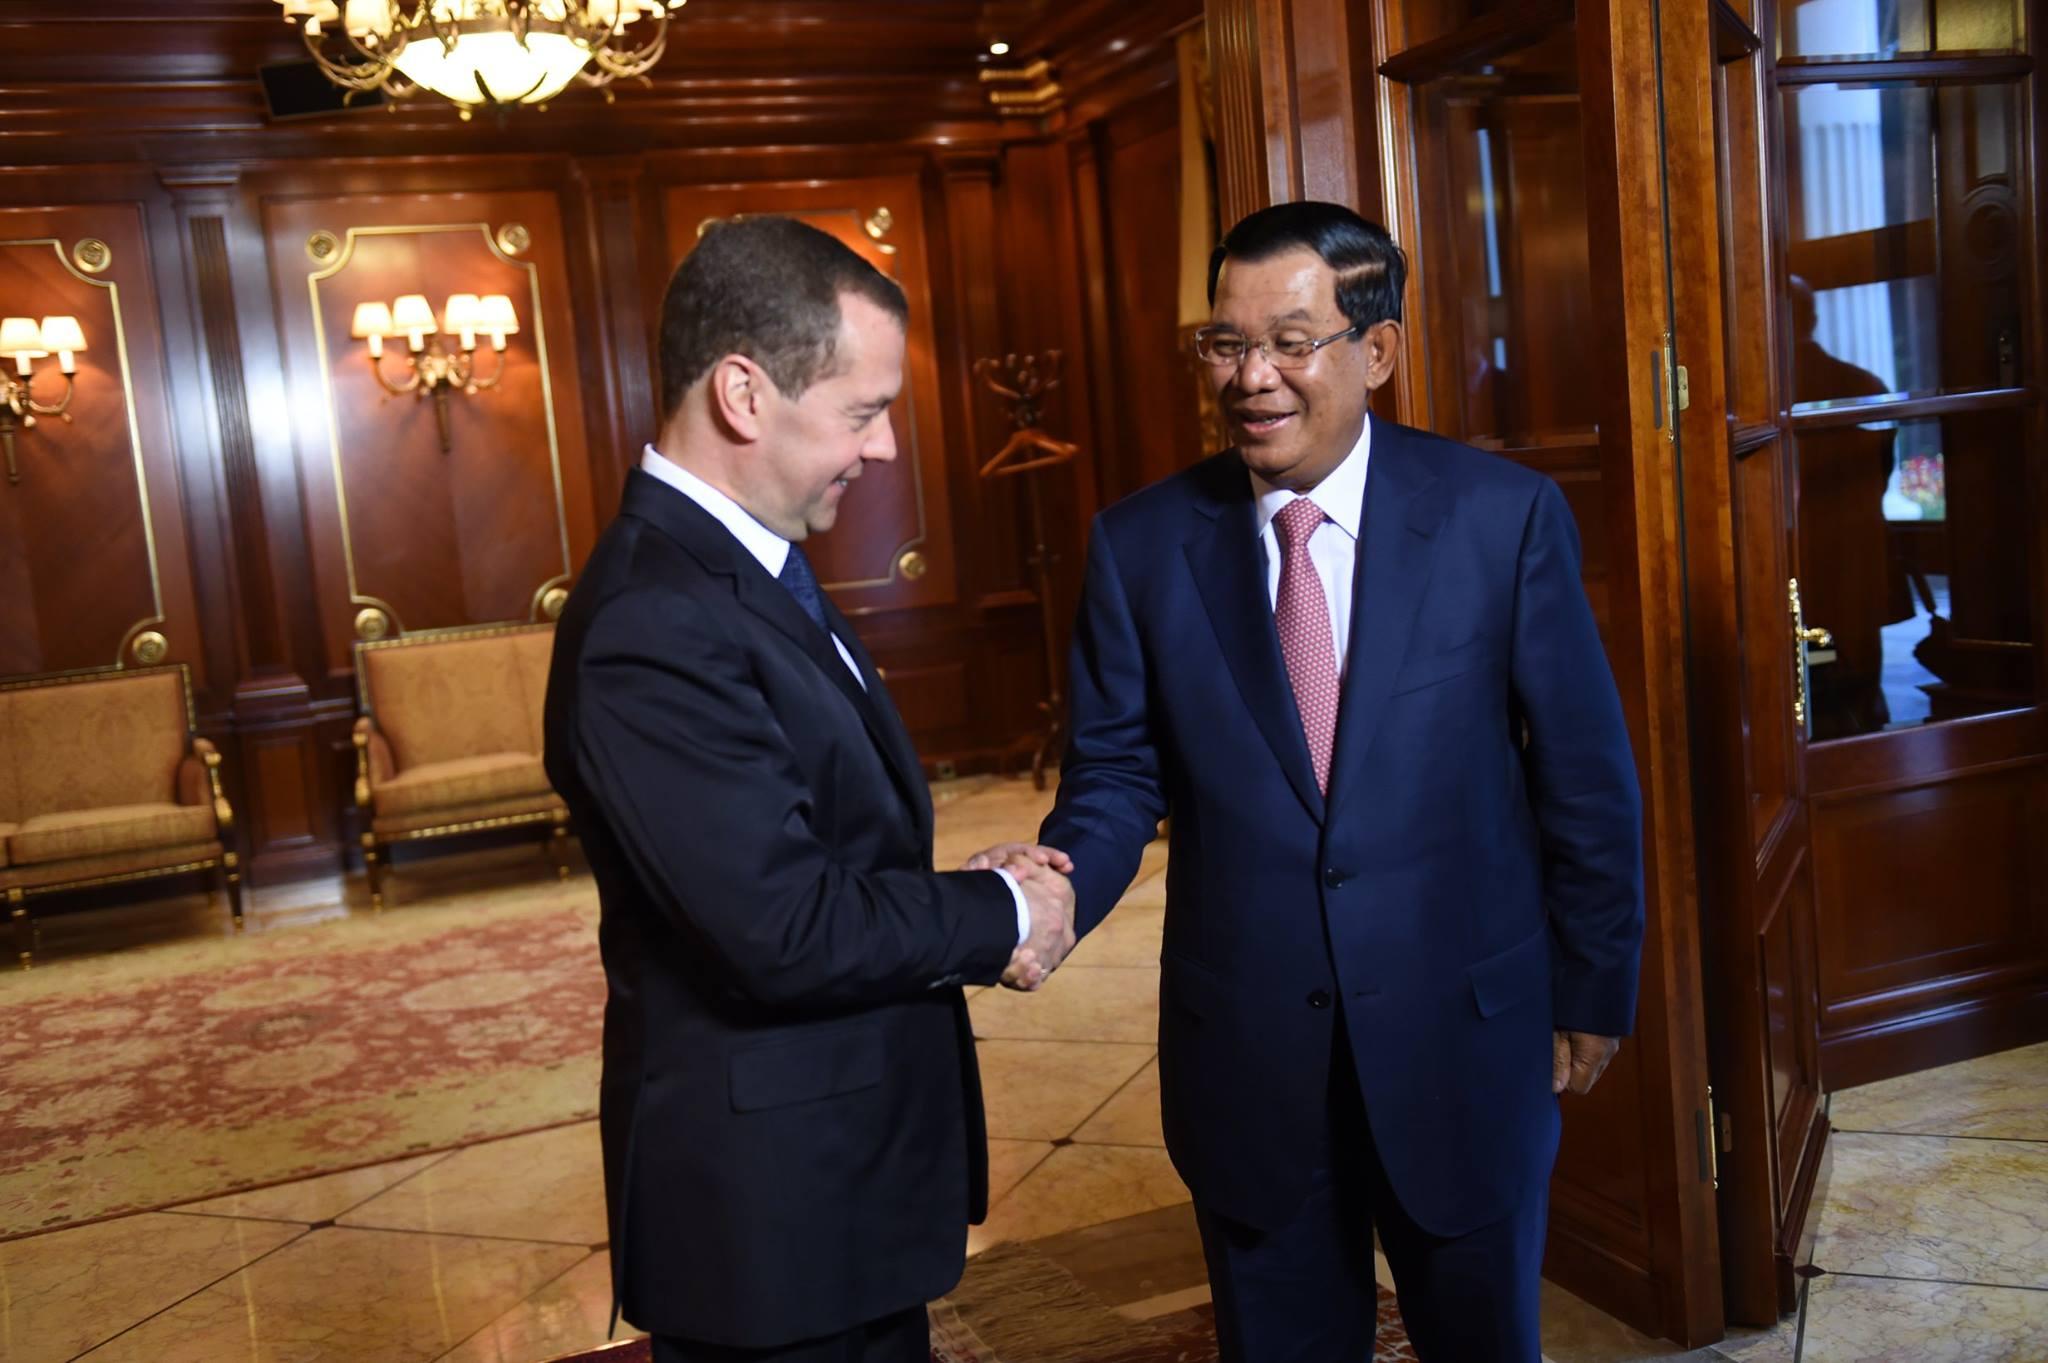 Russian Prime Minister Dmitry Medvedev (L) and Cambodian Prime Minister Hun Sen (R).